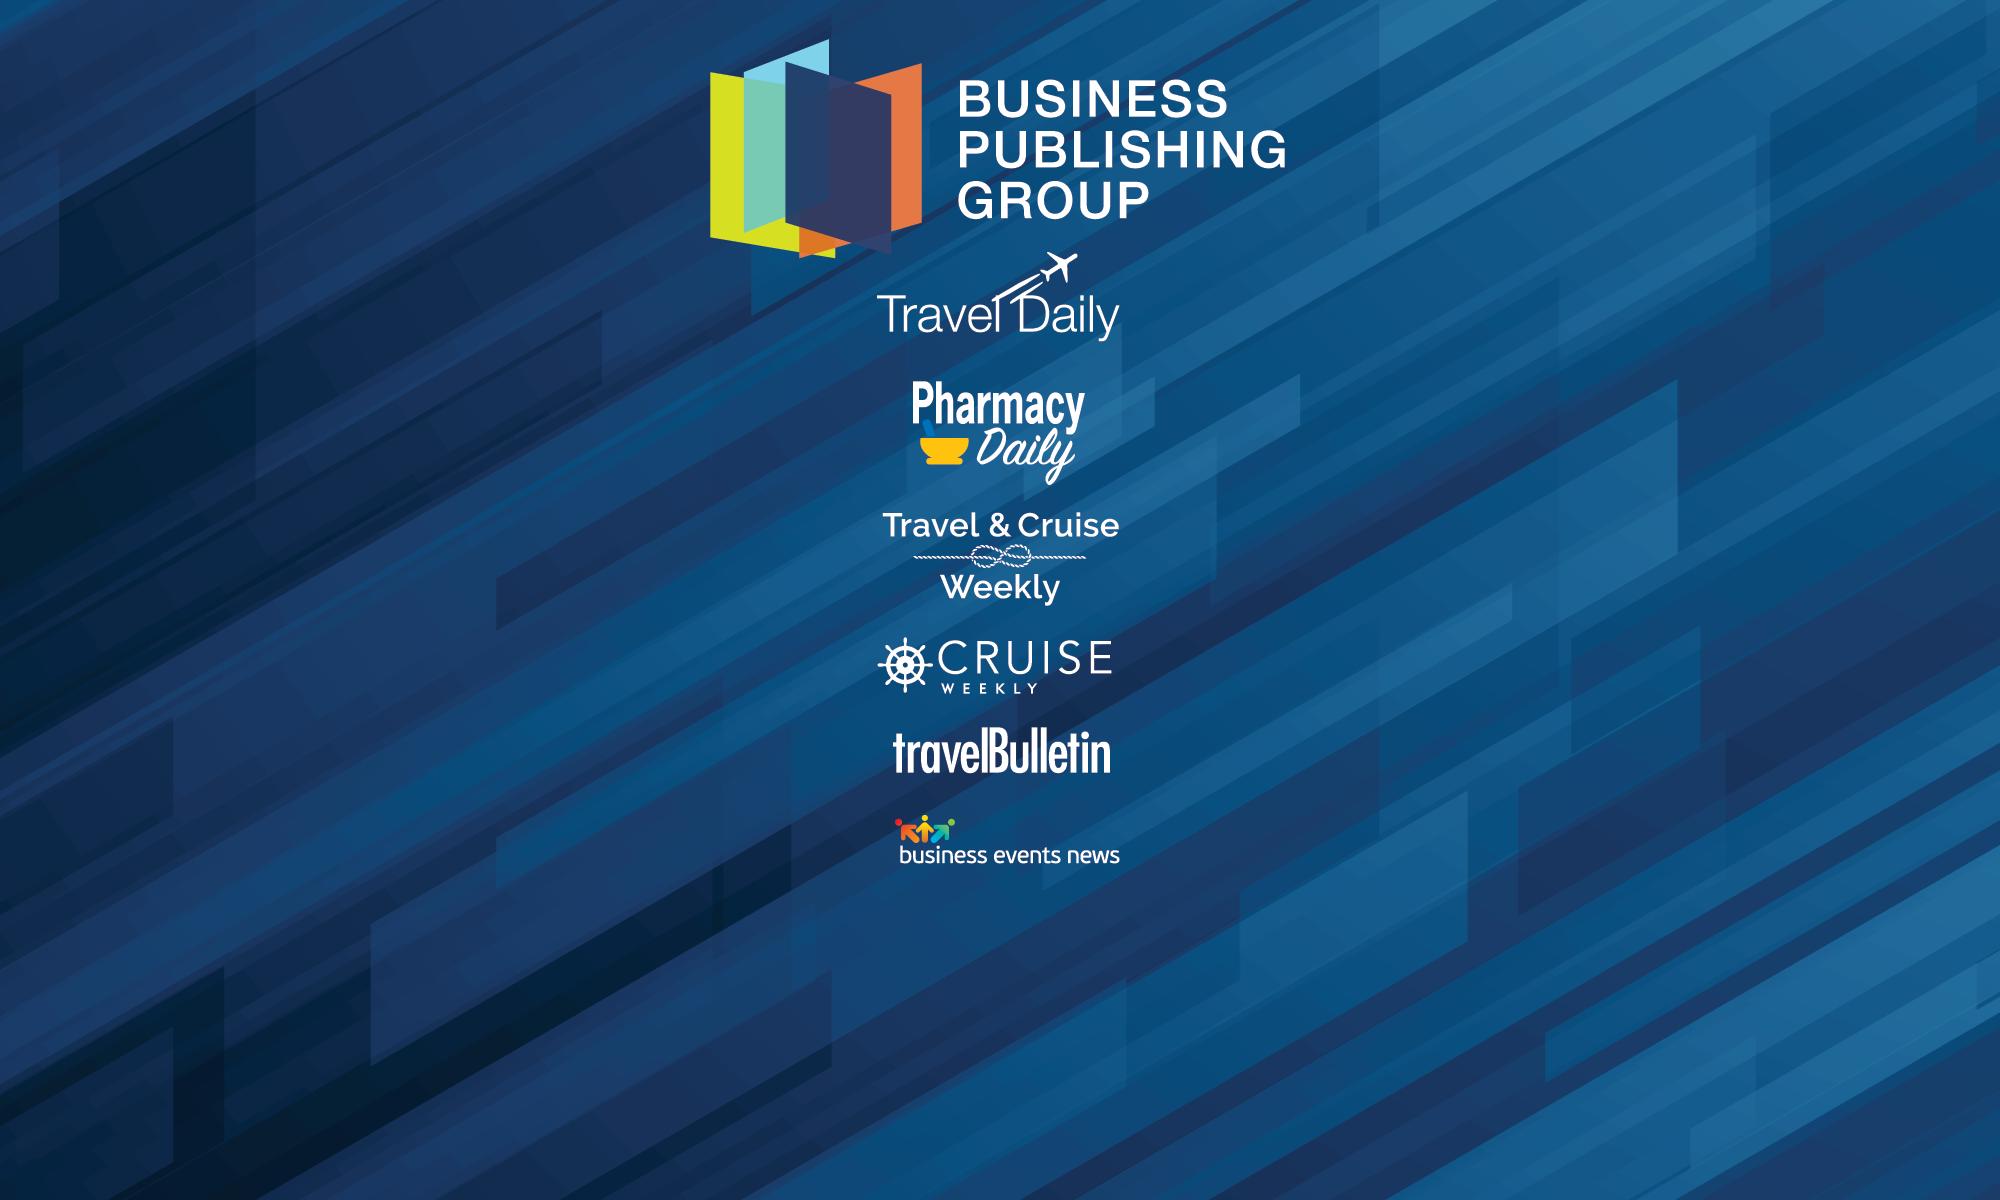 Business Publishing Group